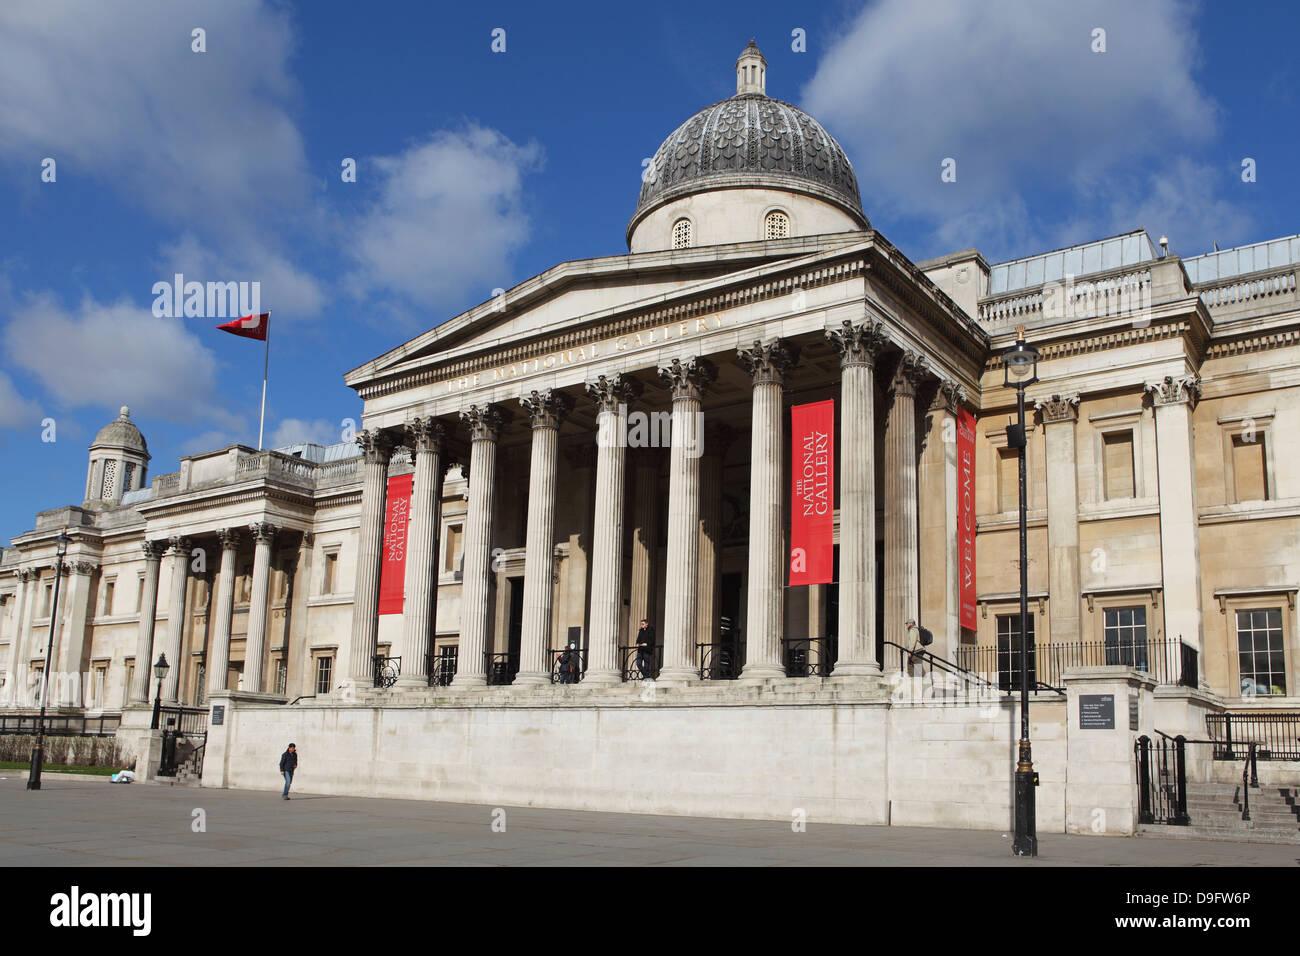 The National Gallery, Trafalgar Square, London, England, UK - Stock Image